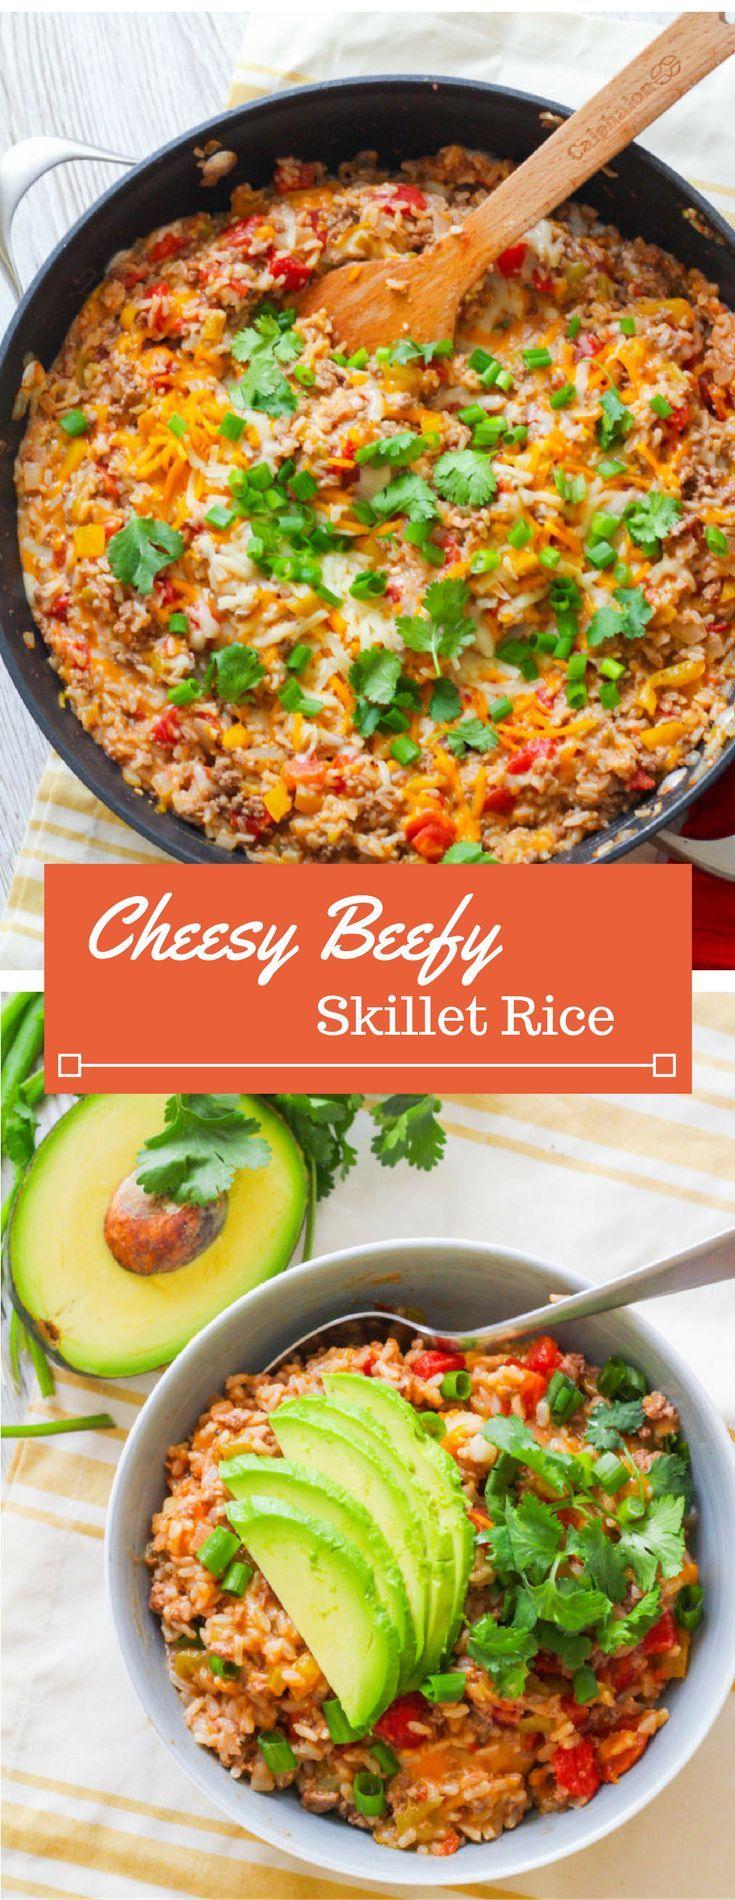 Cheesy Beef Rice Skillet Zen Spice Recipe Ground Pork Recipes Pork Recipes Recipes